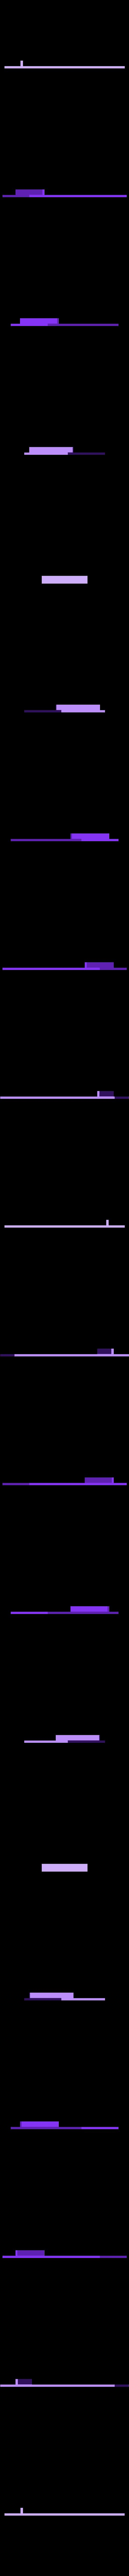 xpi_leftwall#r1.stl Download STL file Raspberry Pi 4 case XPI • 3D printing template, Steenberg